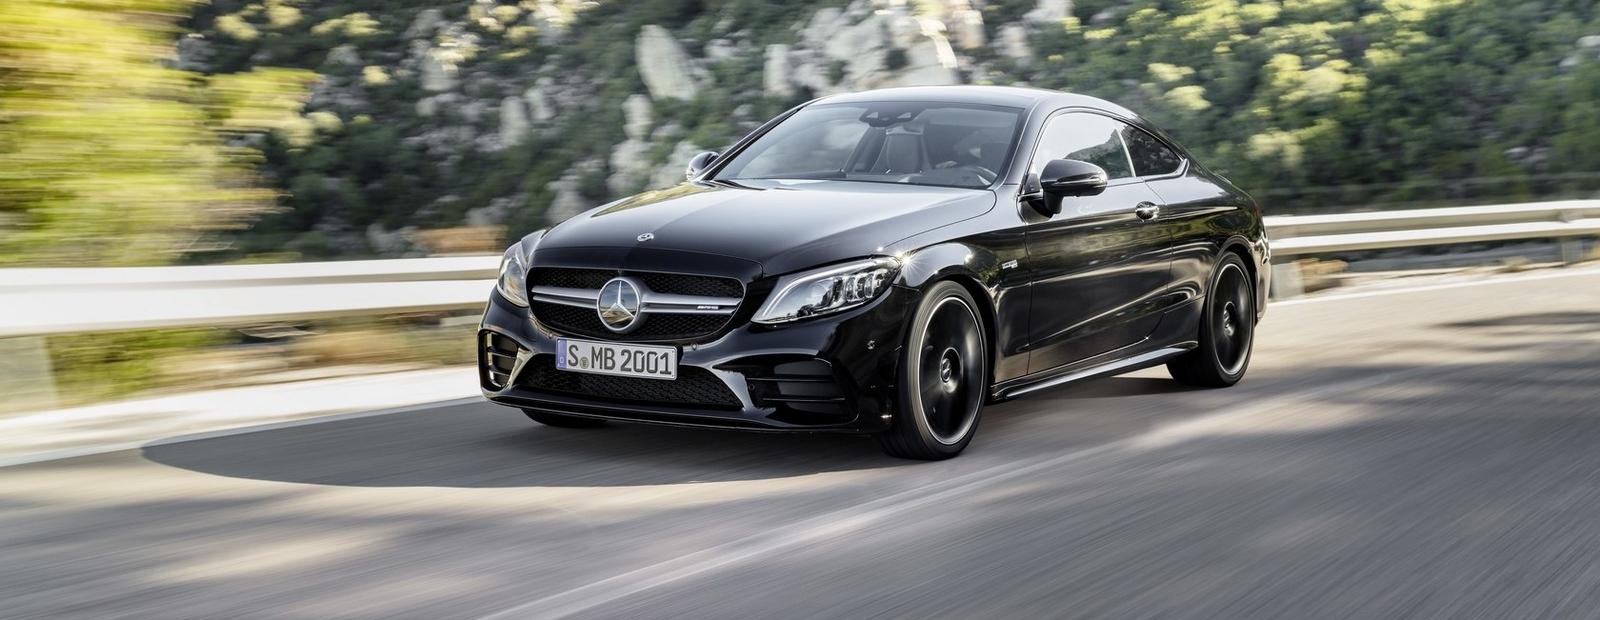 Mercedes обновил и «прокачал» купе и кабриолеты C-Class